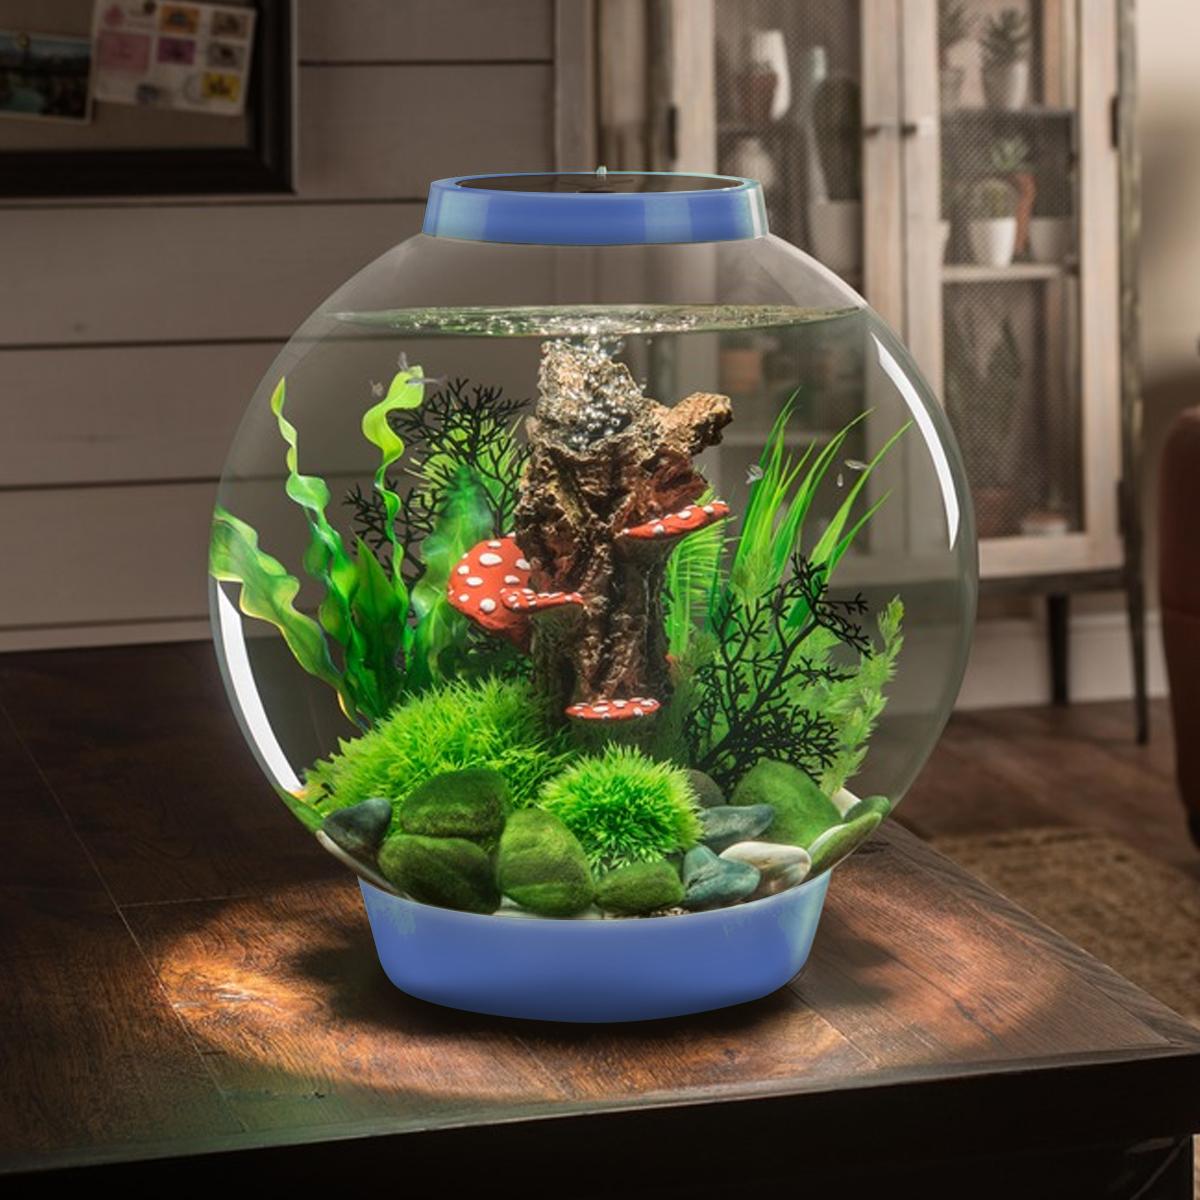 Biorb classic 30l denim blue aquarium led lighting acrylic for Fish tank bowl